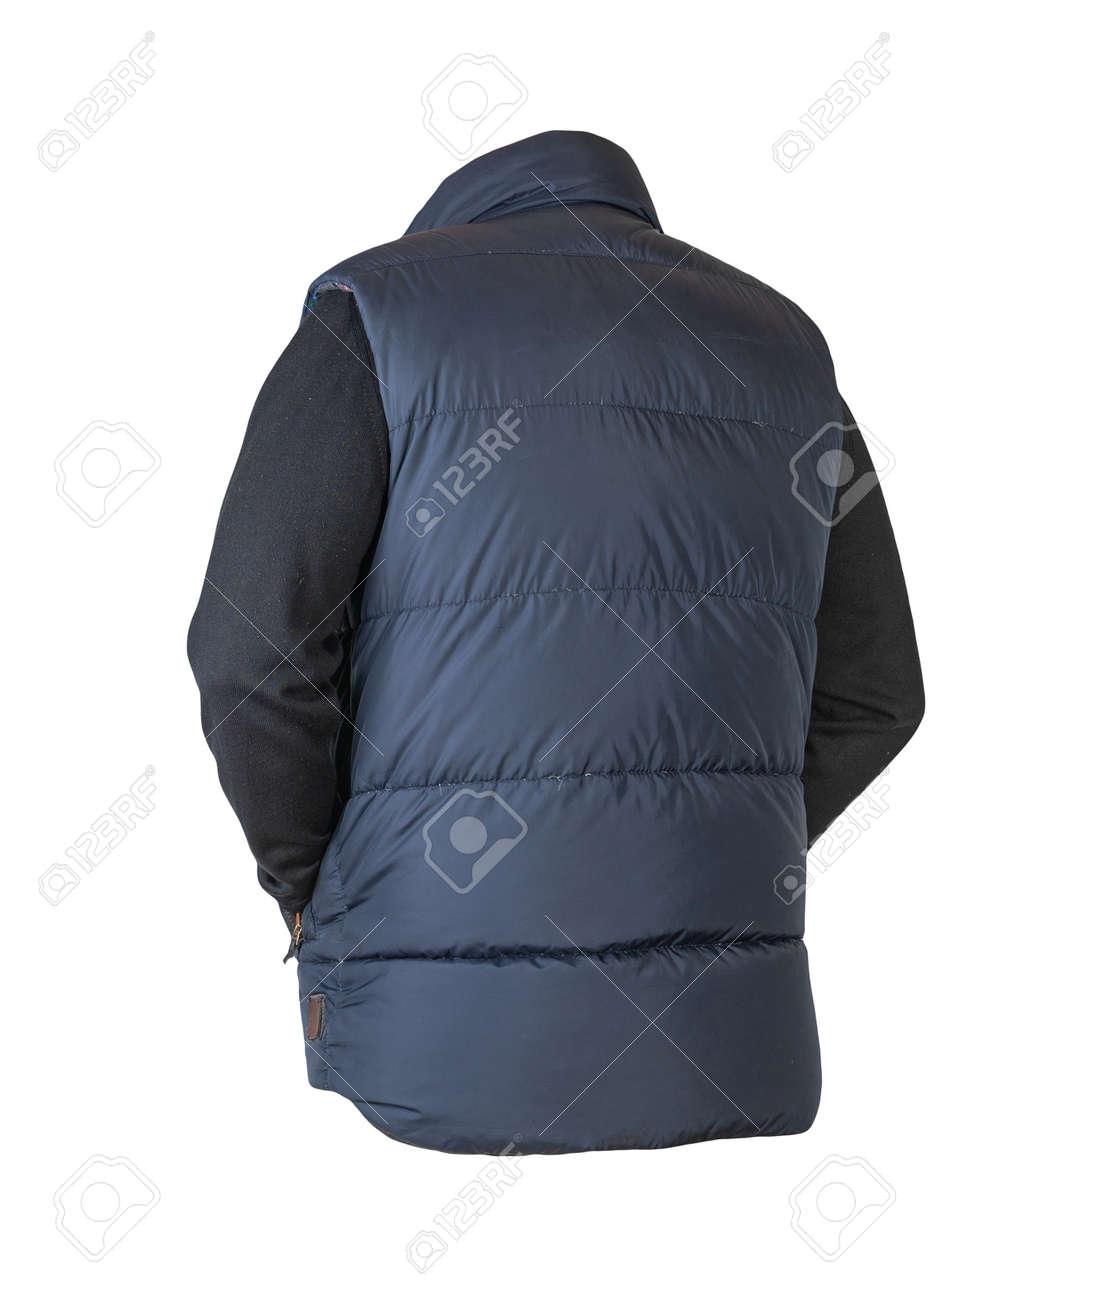 dark blue sleeveless jacket and black sweater isolated on white background. casual wear - 172073704